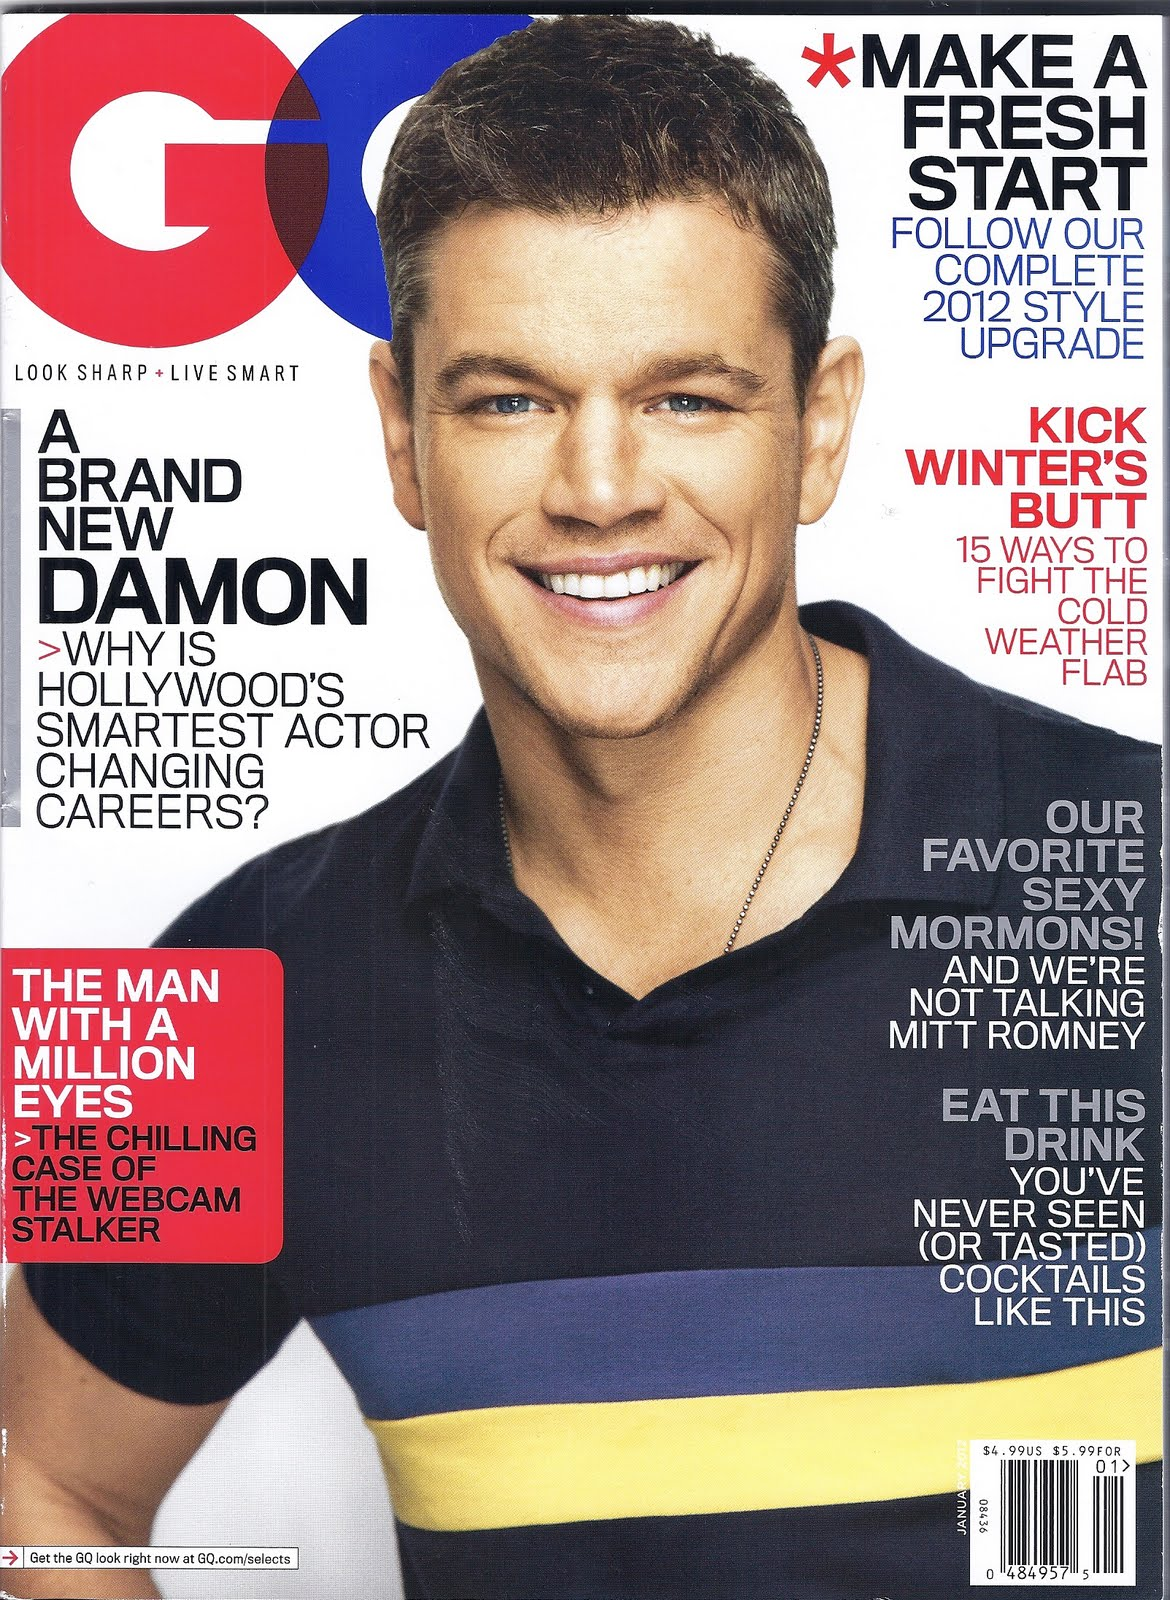 gq magazine cover template - vitor shaolin tv shaolin in gq magazine